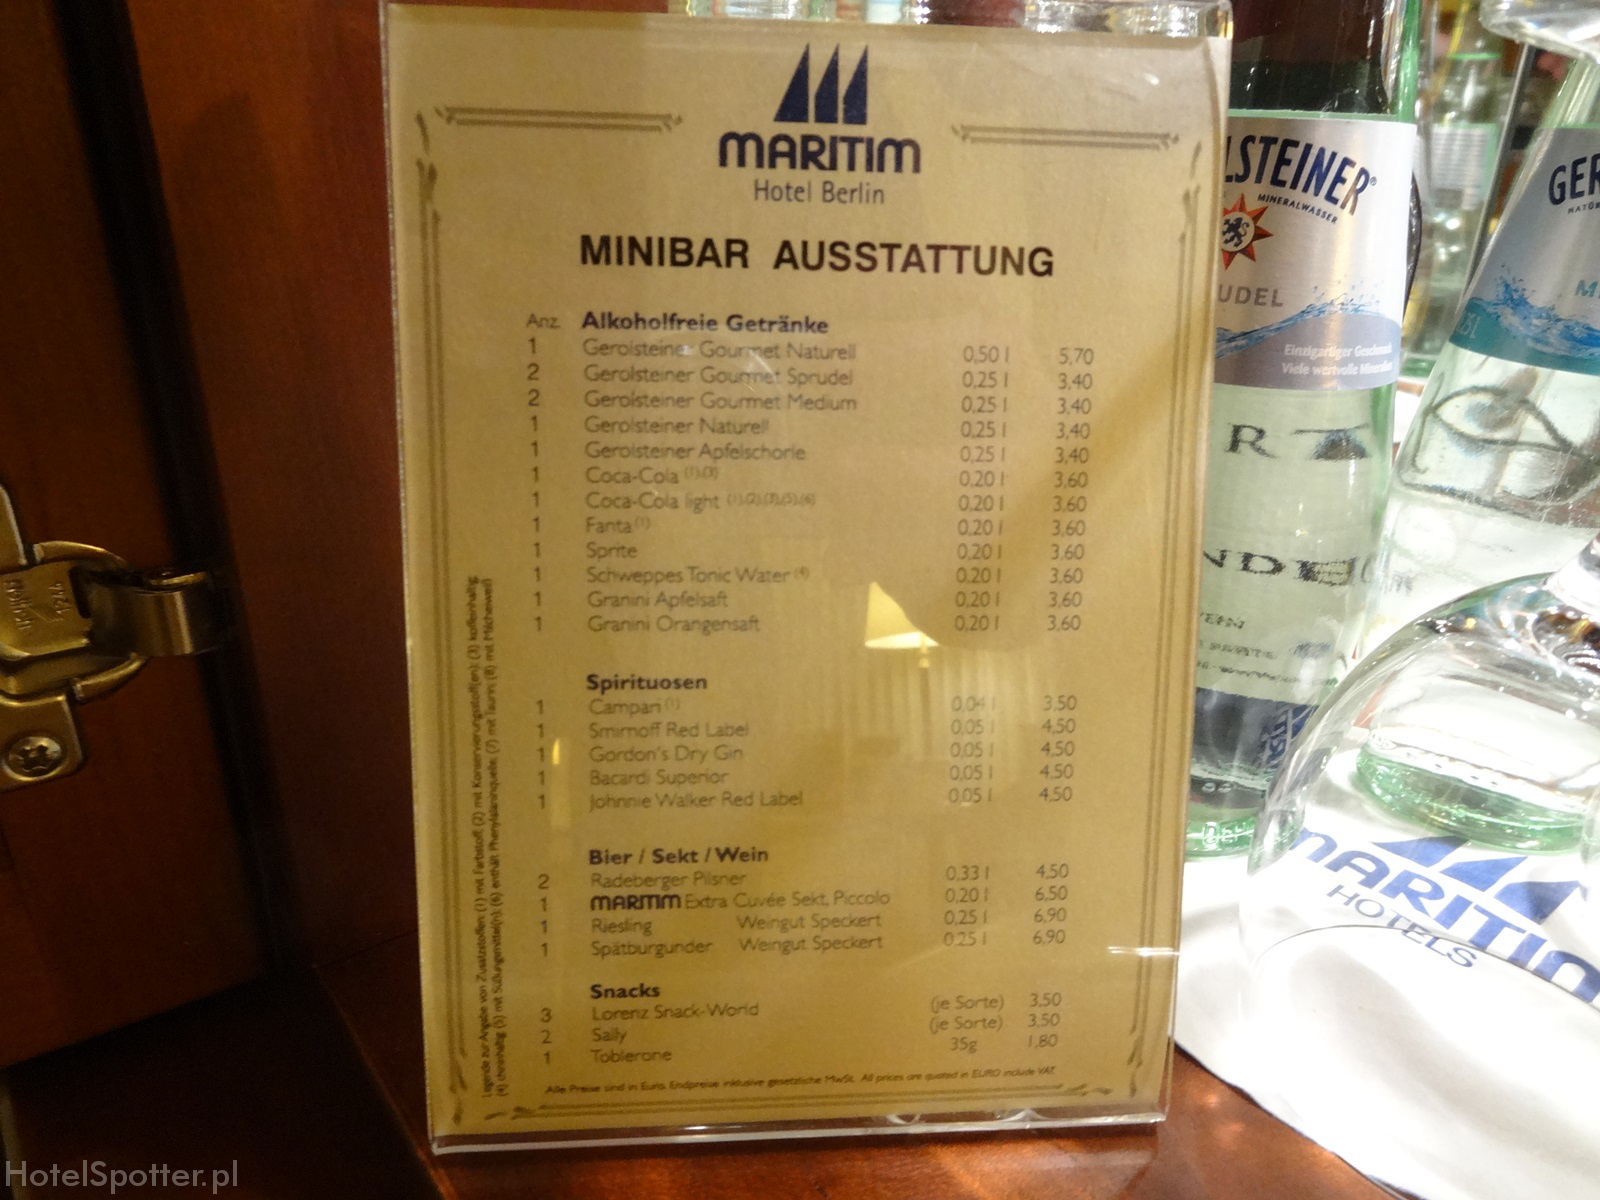 Maritim Hotel Berlin - ceny minibar prices